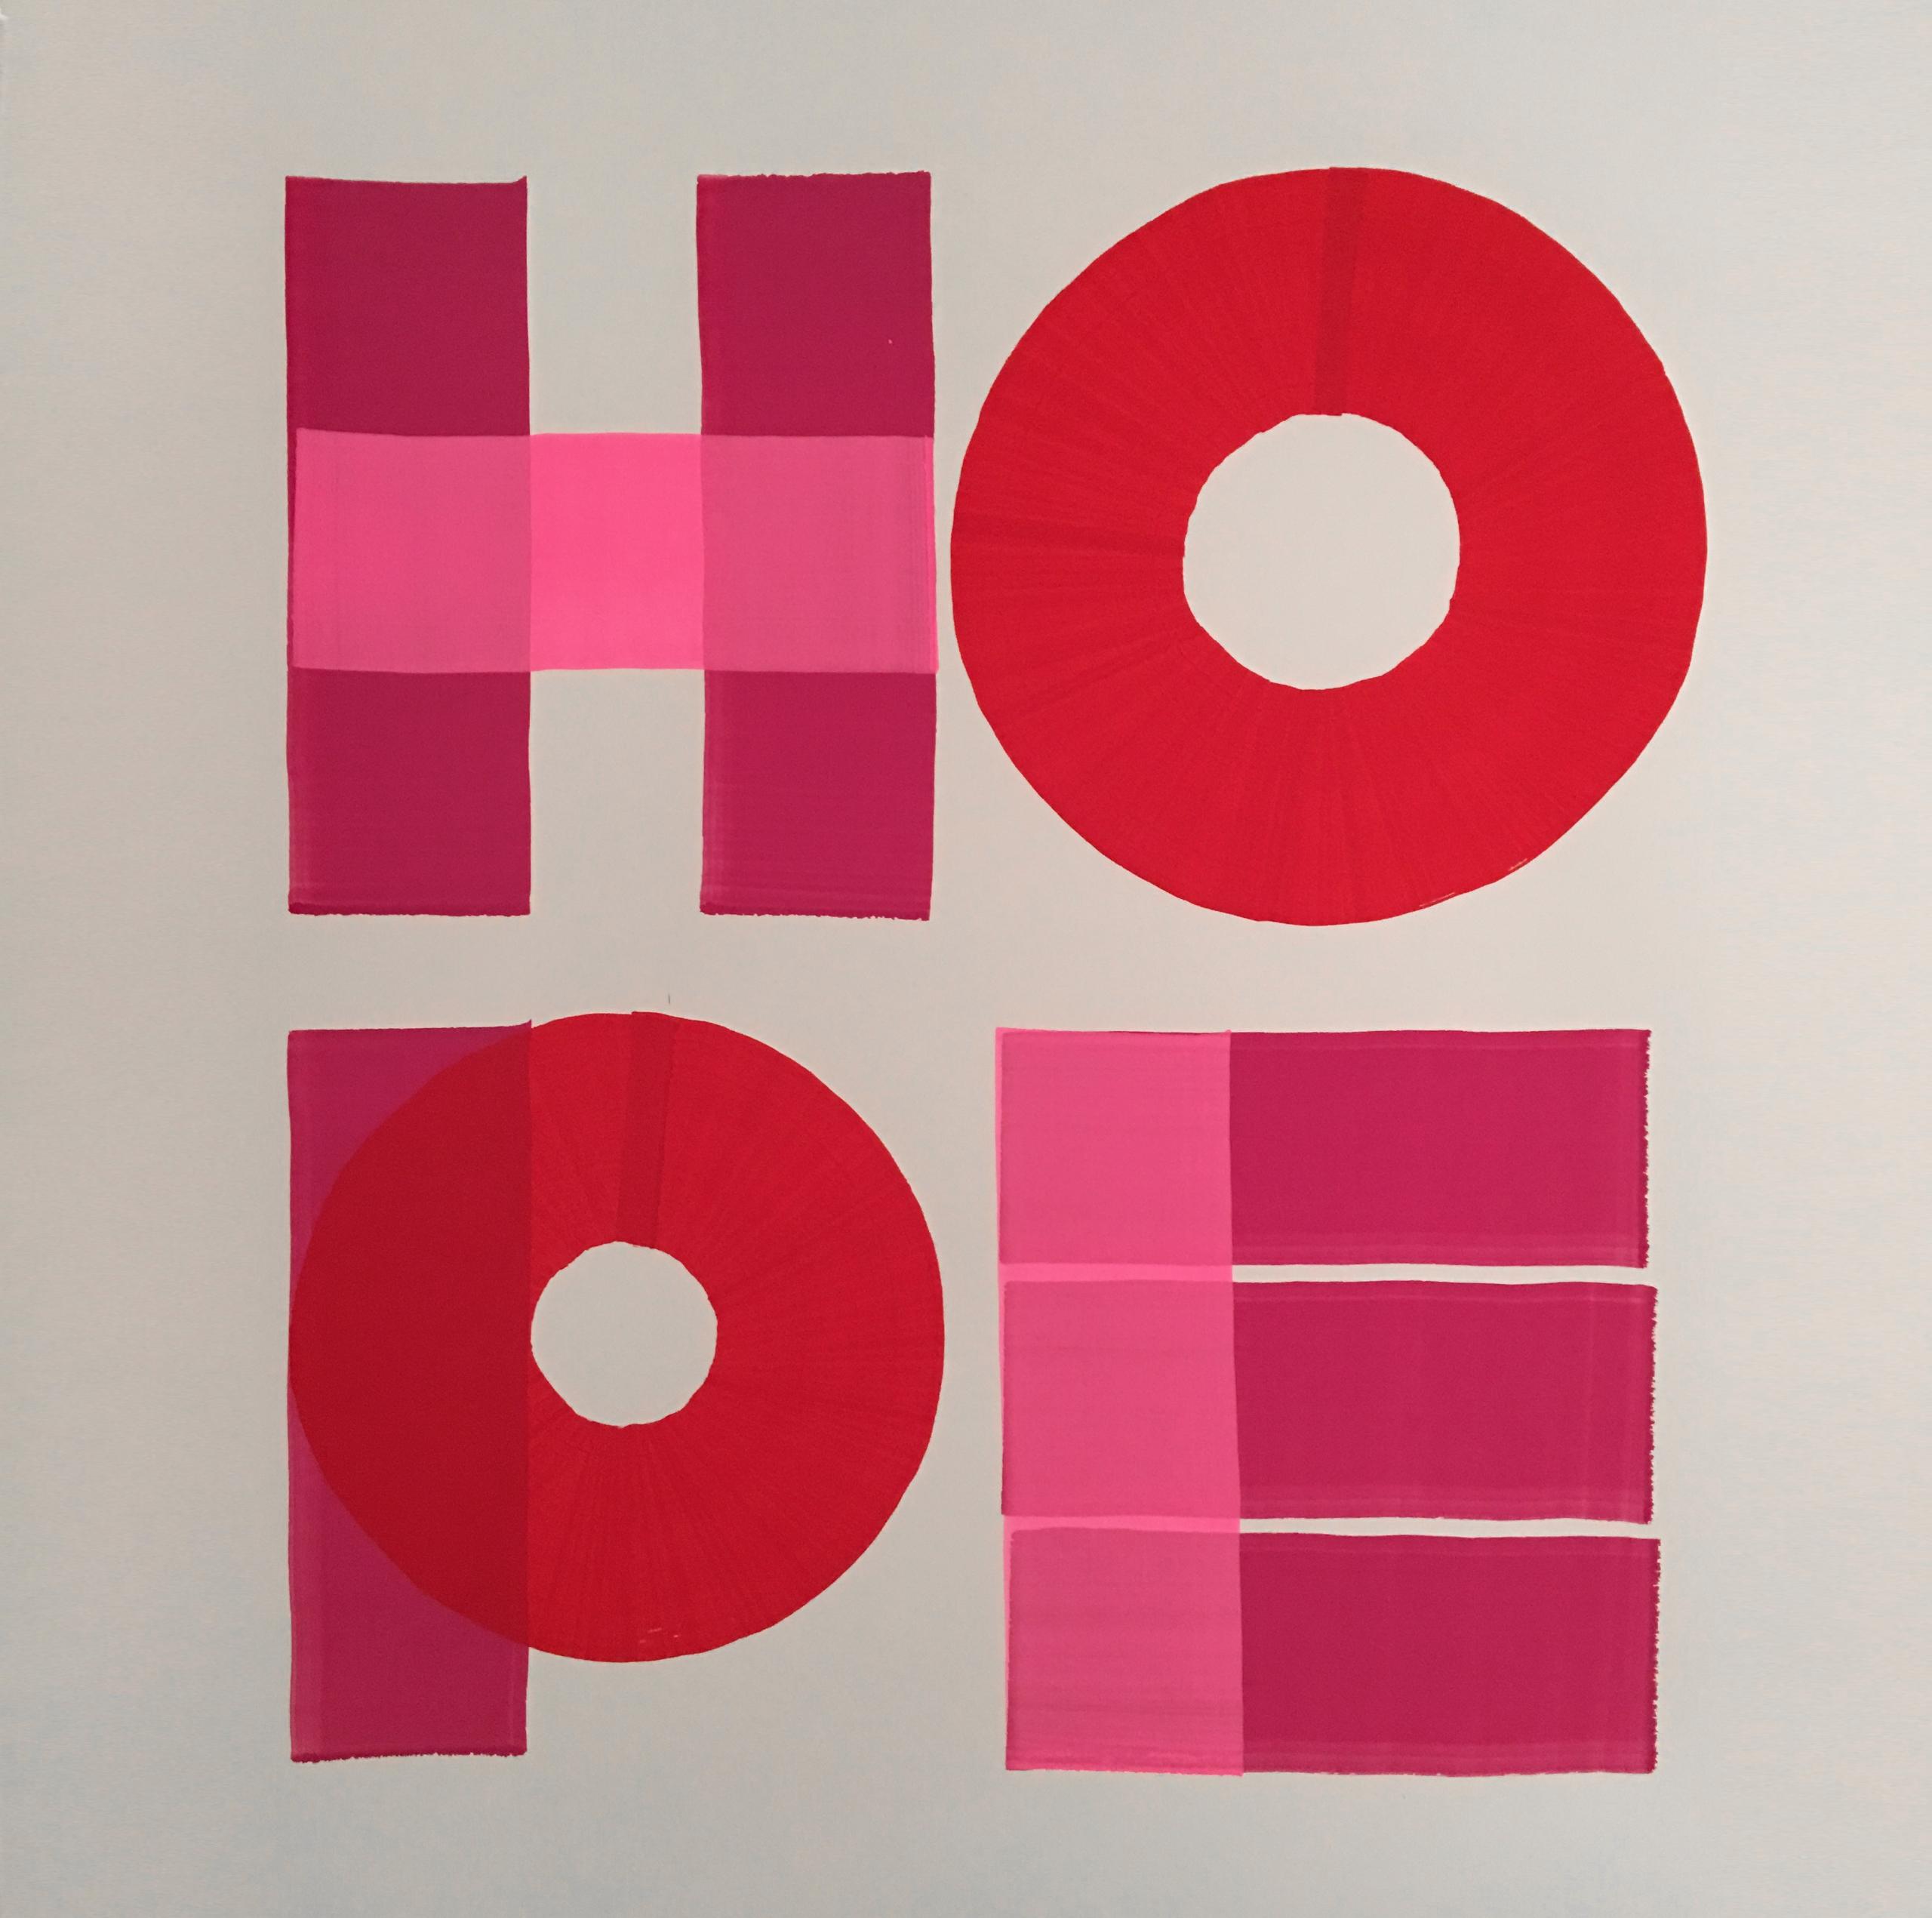 HOPE art typography Buy online  - t_o_w_e_r_s | ello